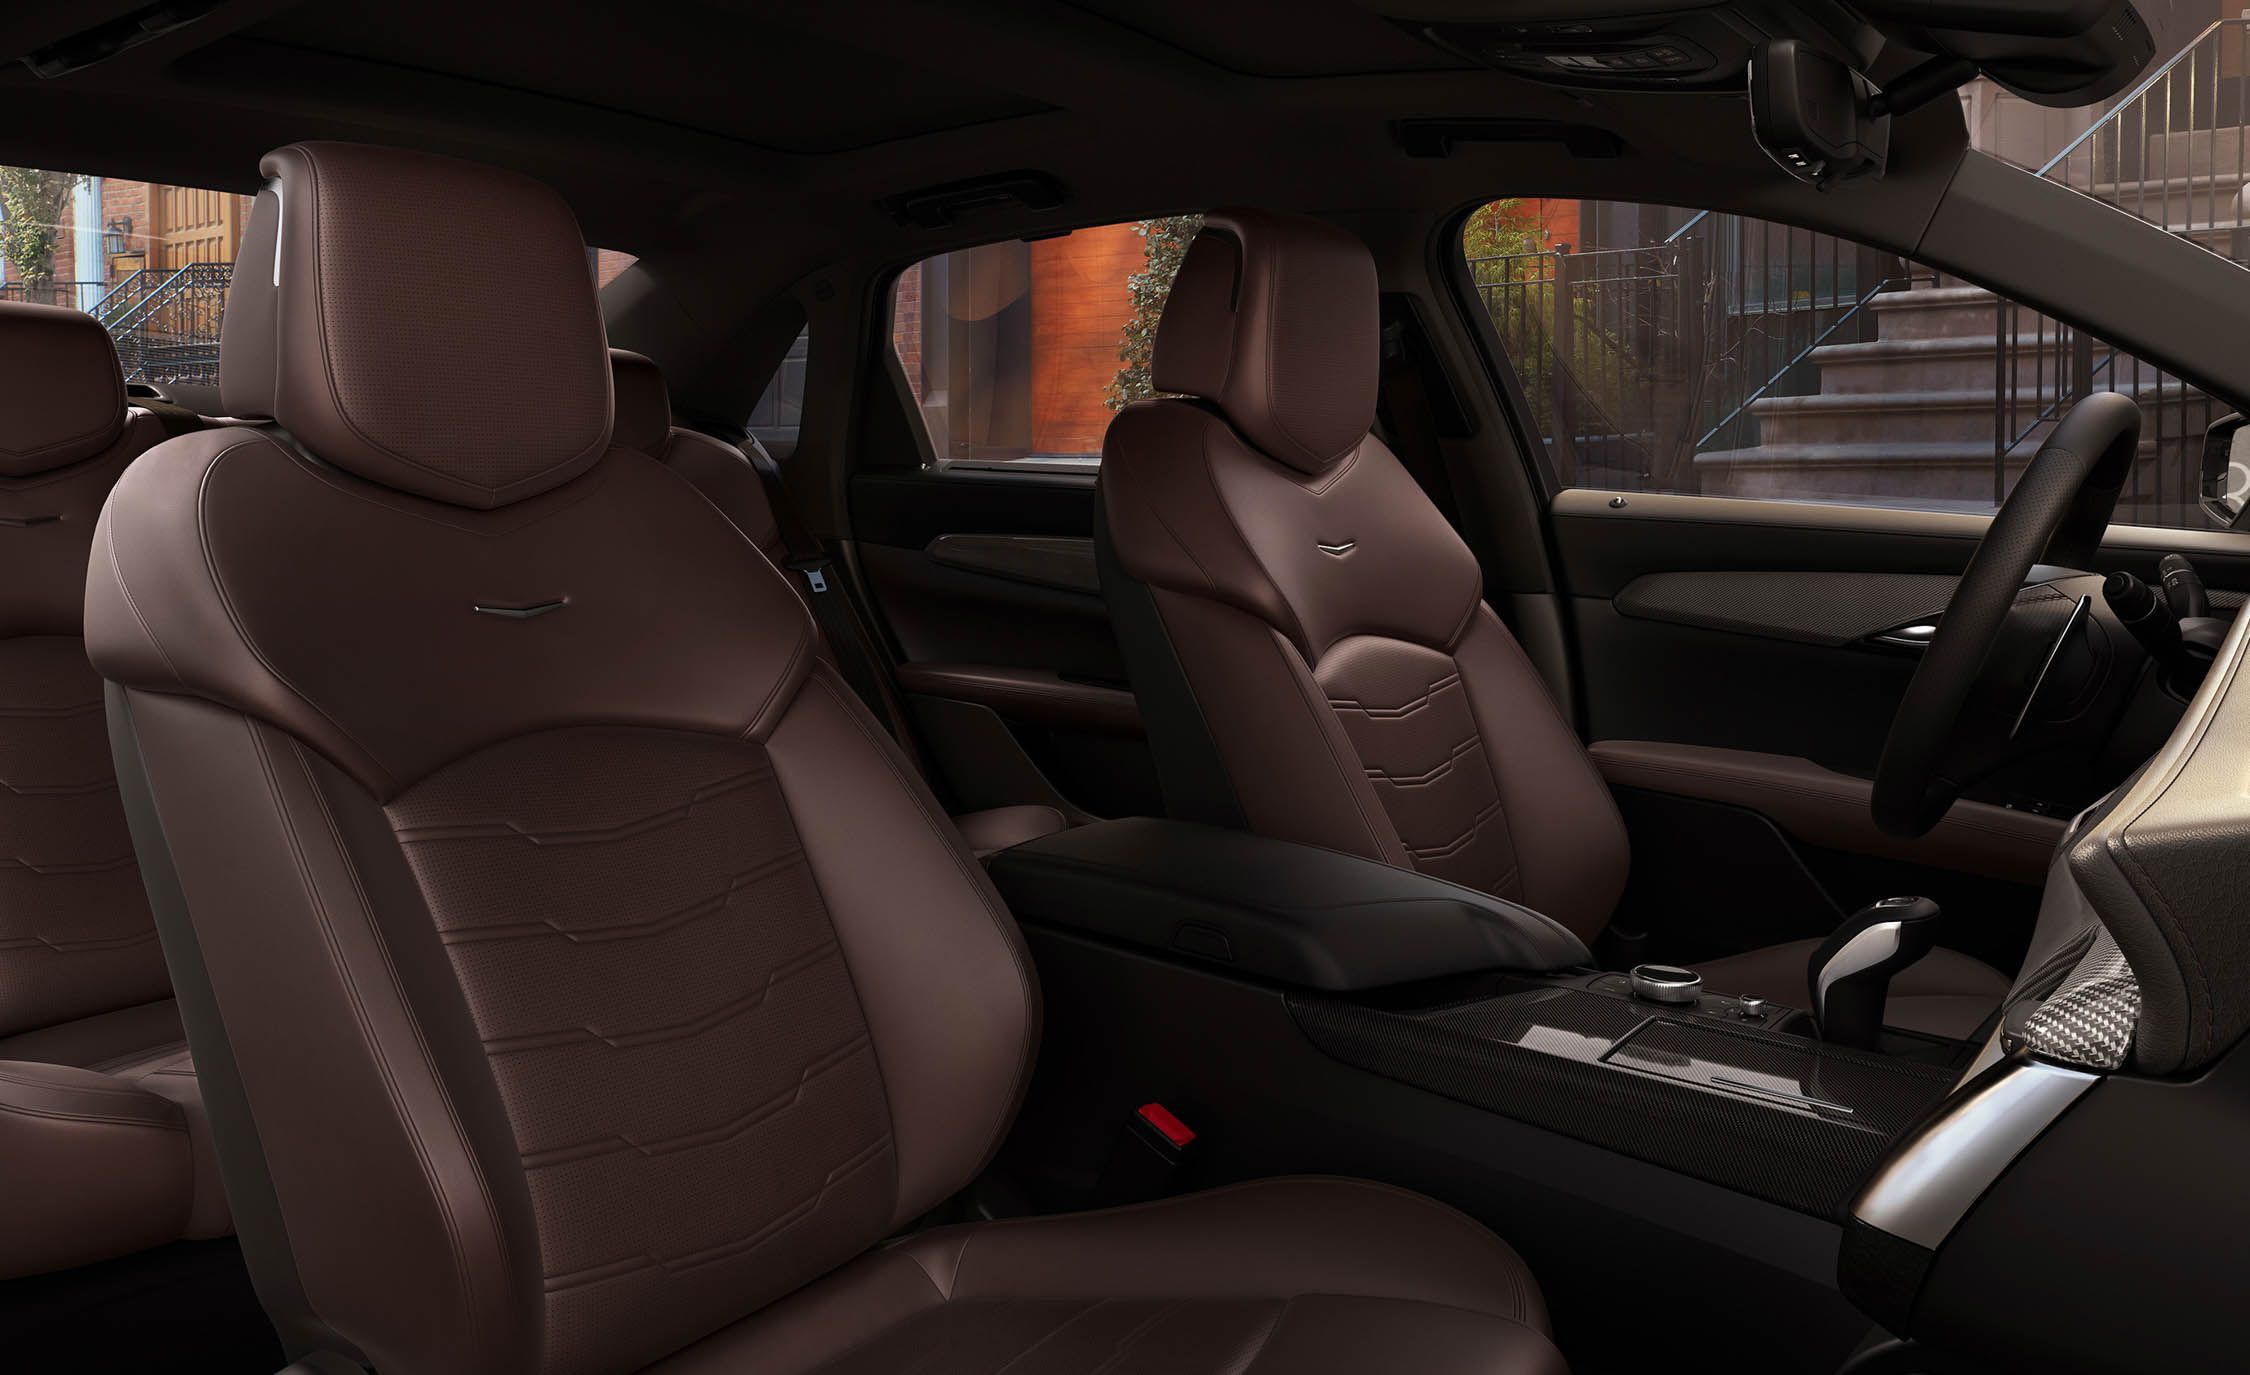 2019 Cadillac CT6 V-Sport Interior Wallpapers (10)